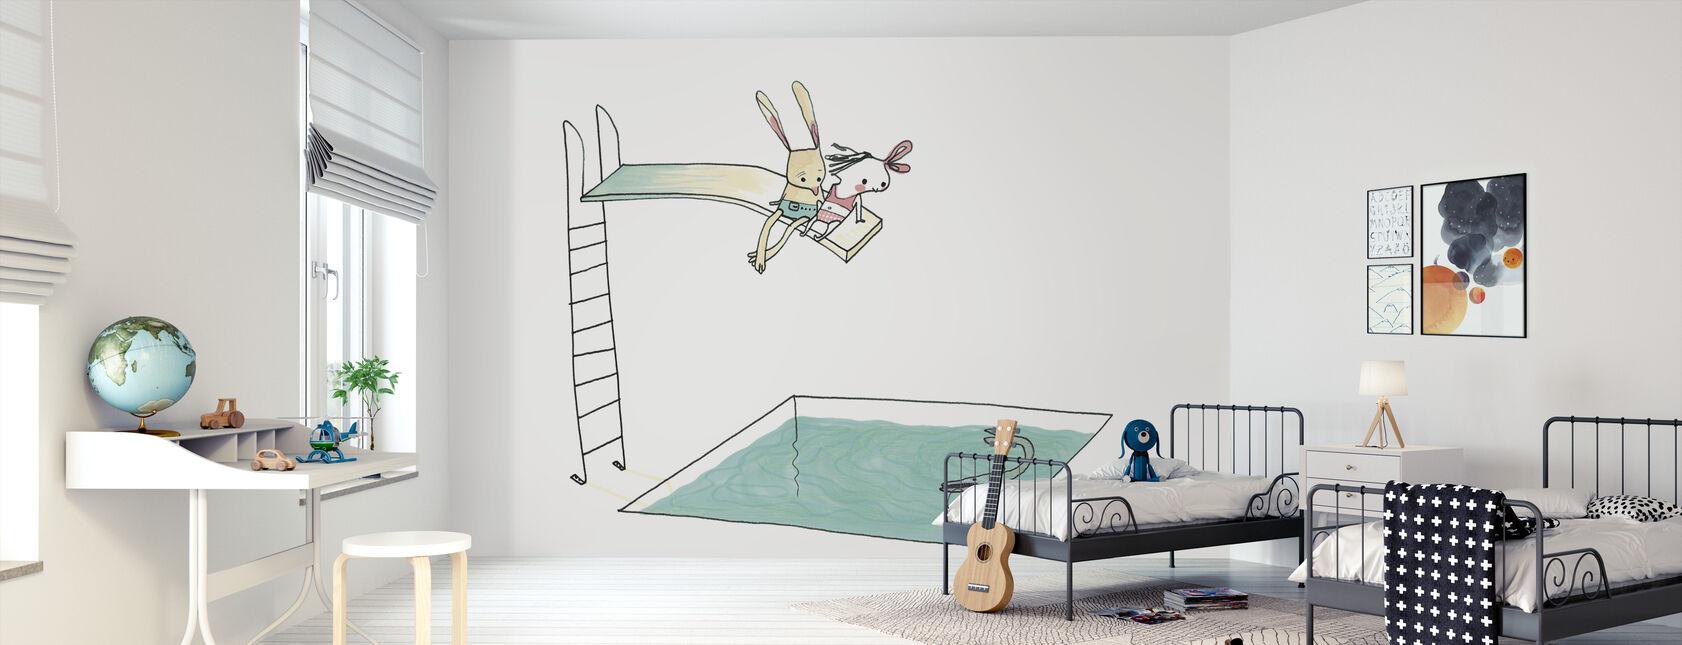 On the Trampoline Near The Rabbit - Wallpaper - Kids Room